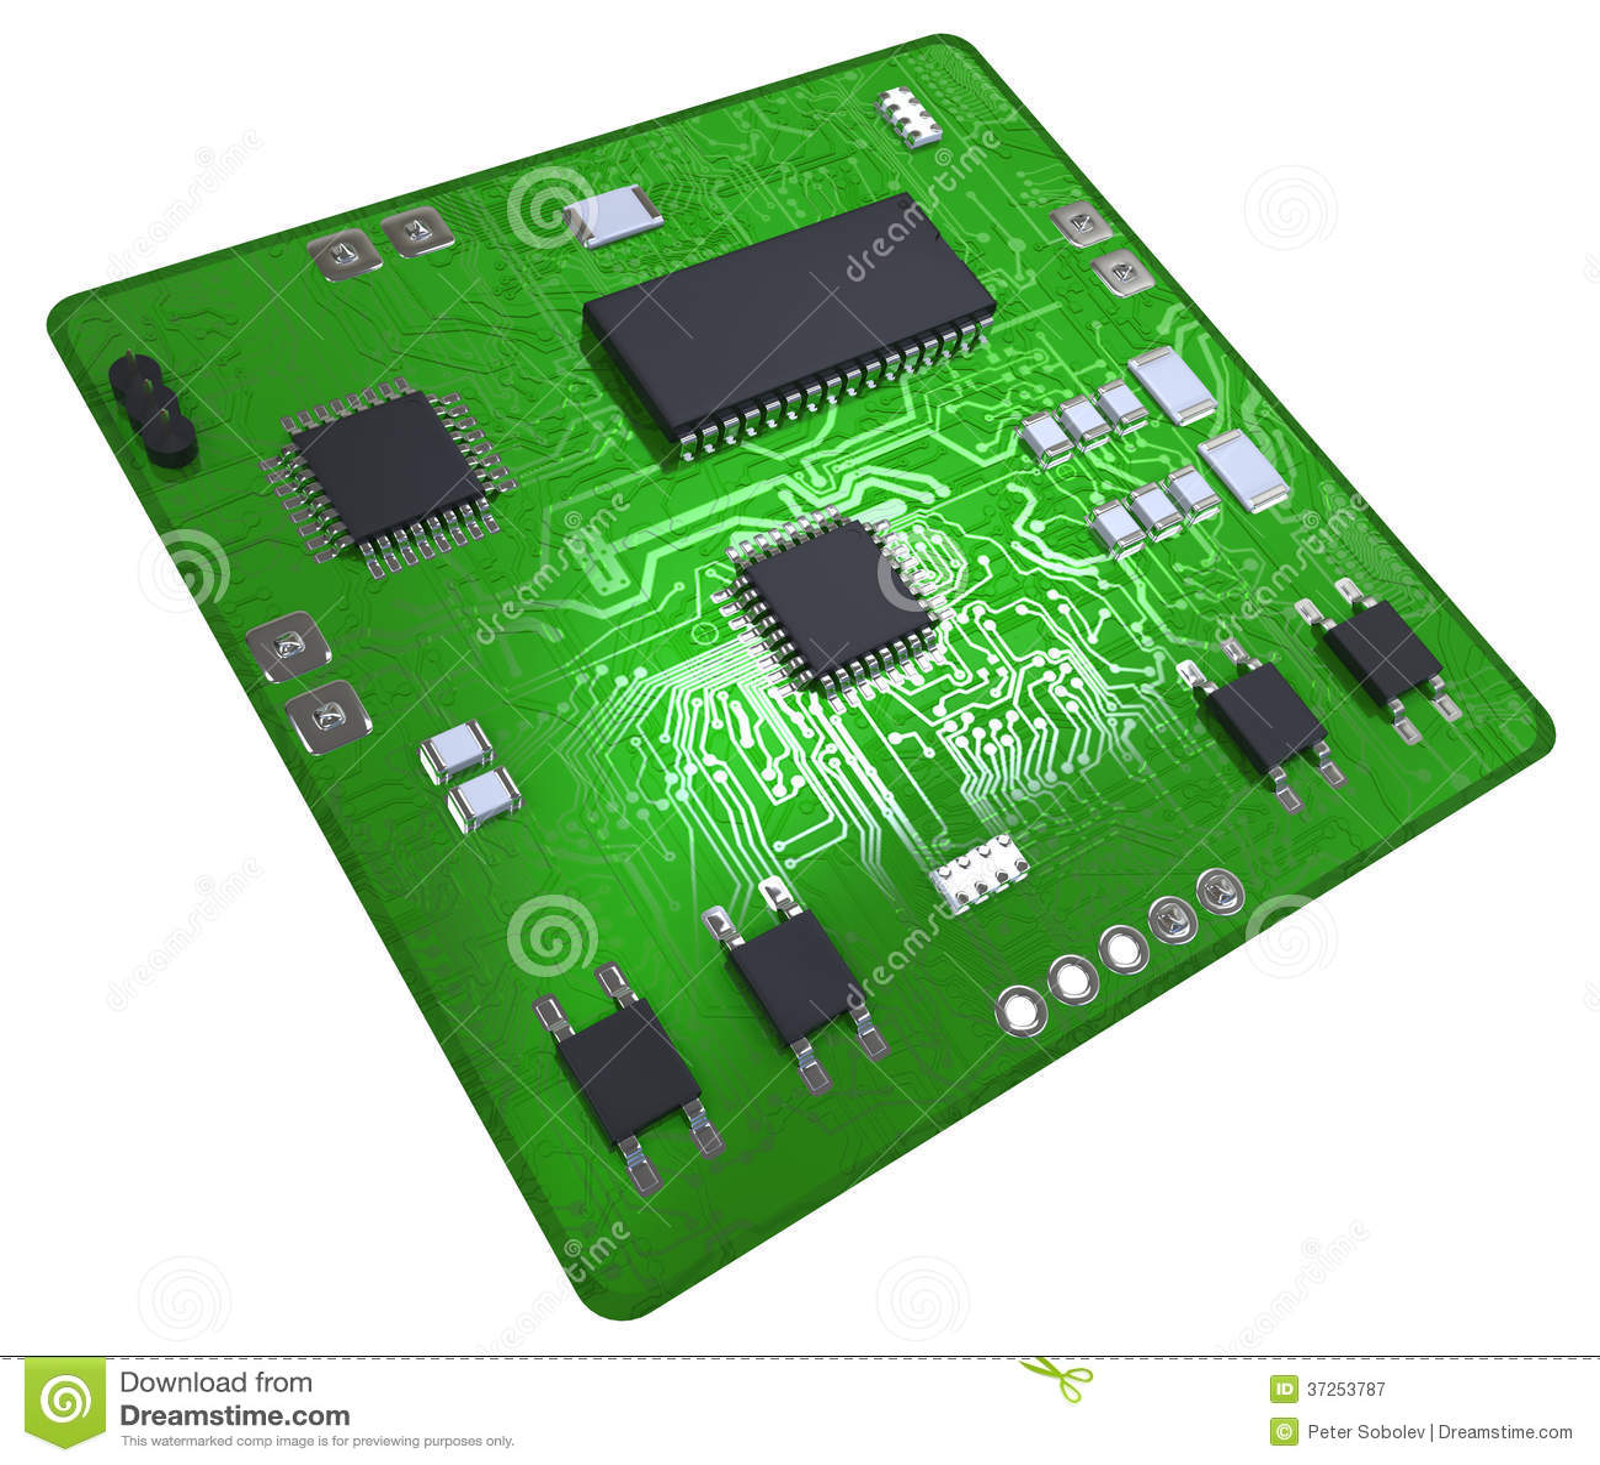 printed circuit board stock illustration illustration of rh dreamstime com